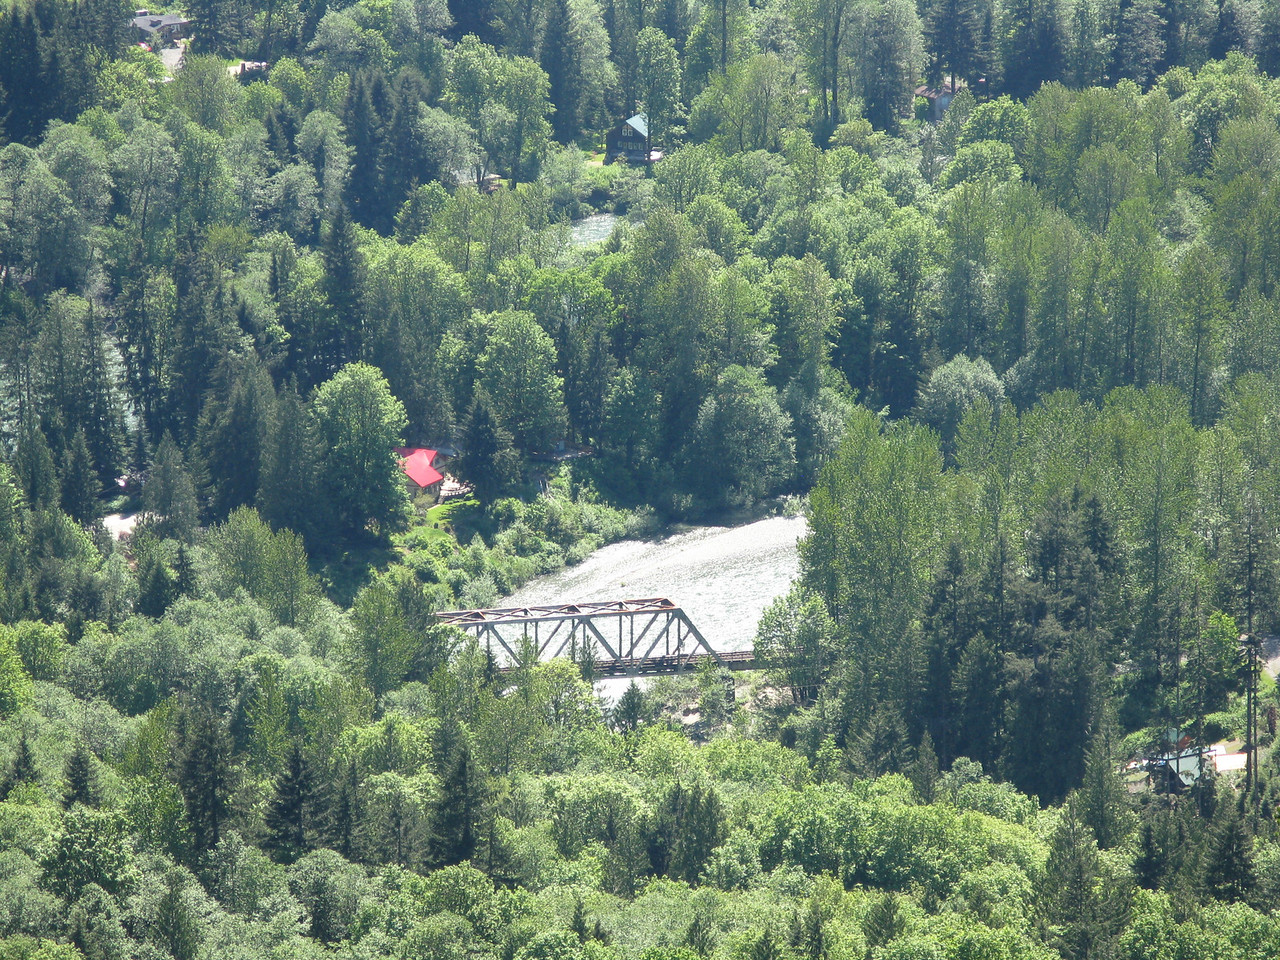 2011-06-04 HB LO 028